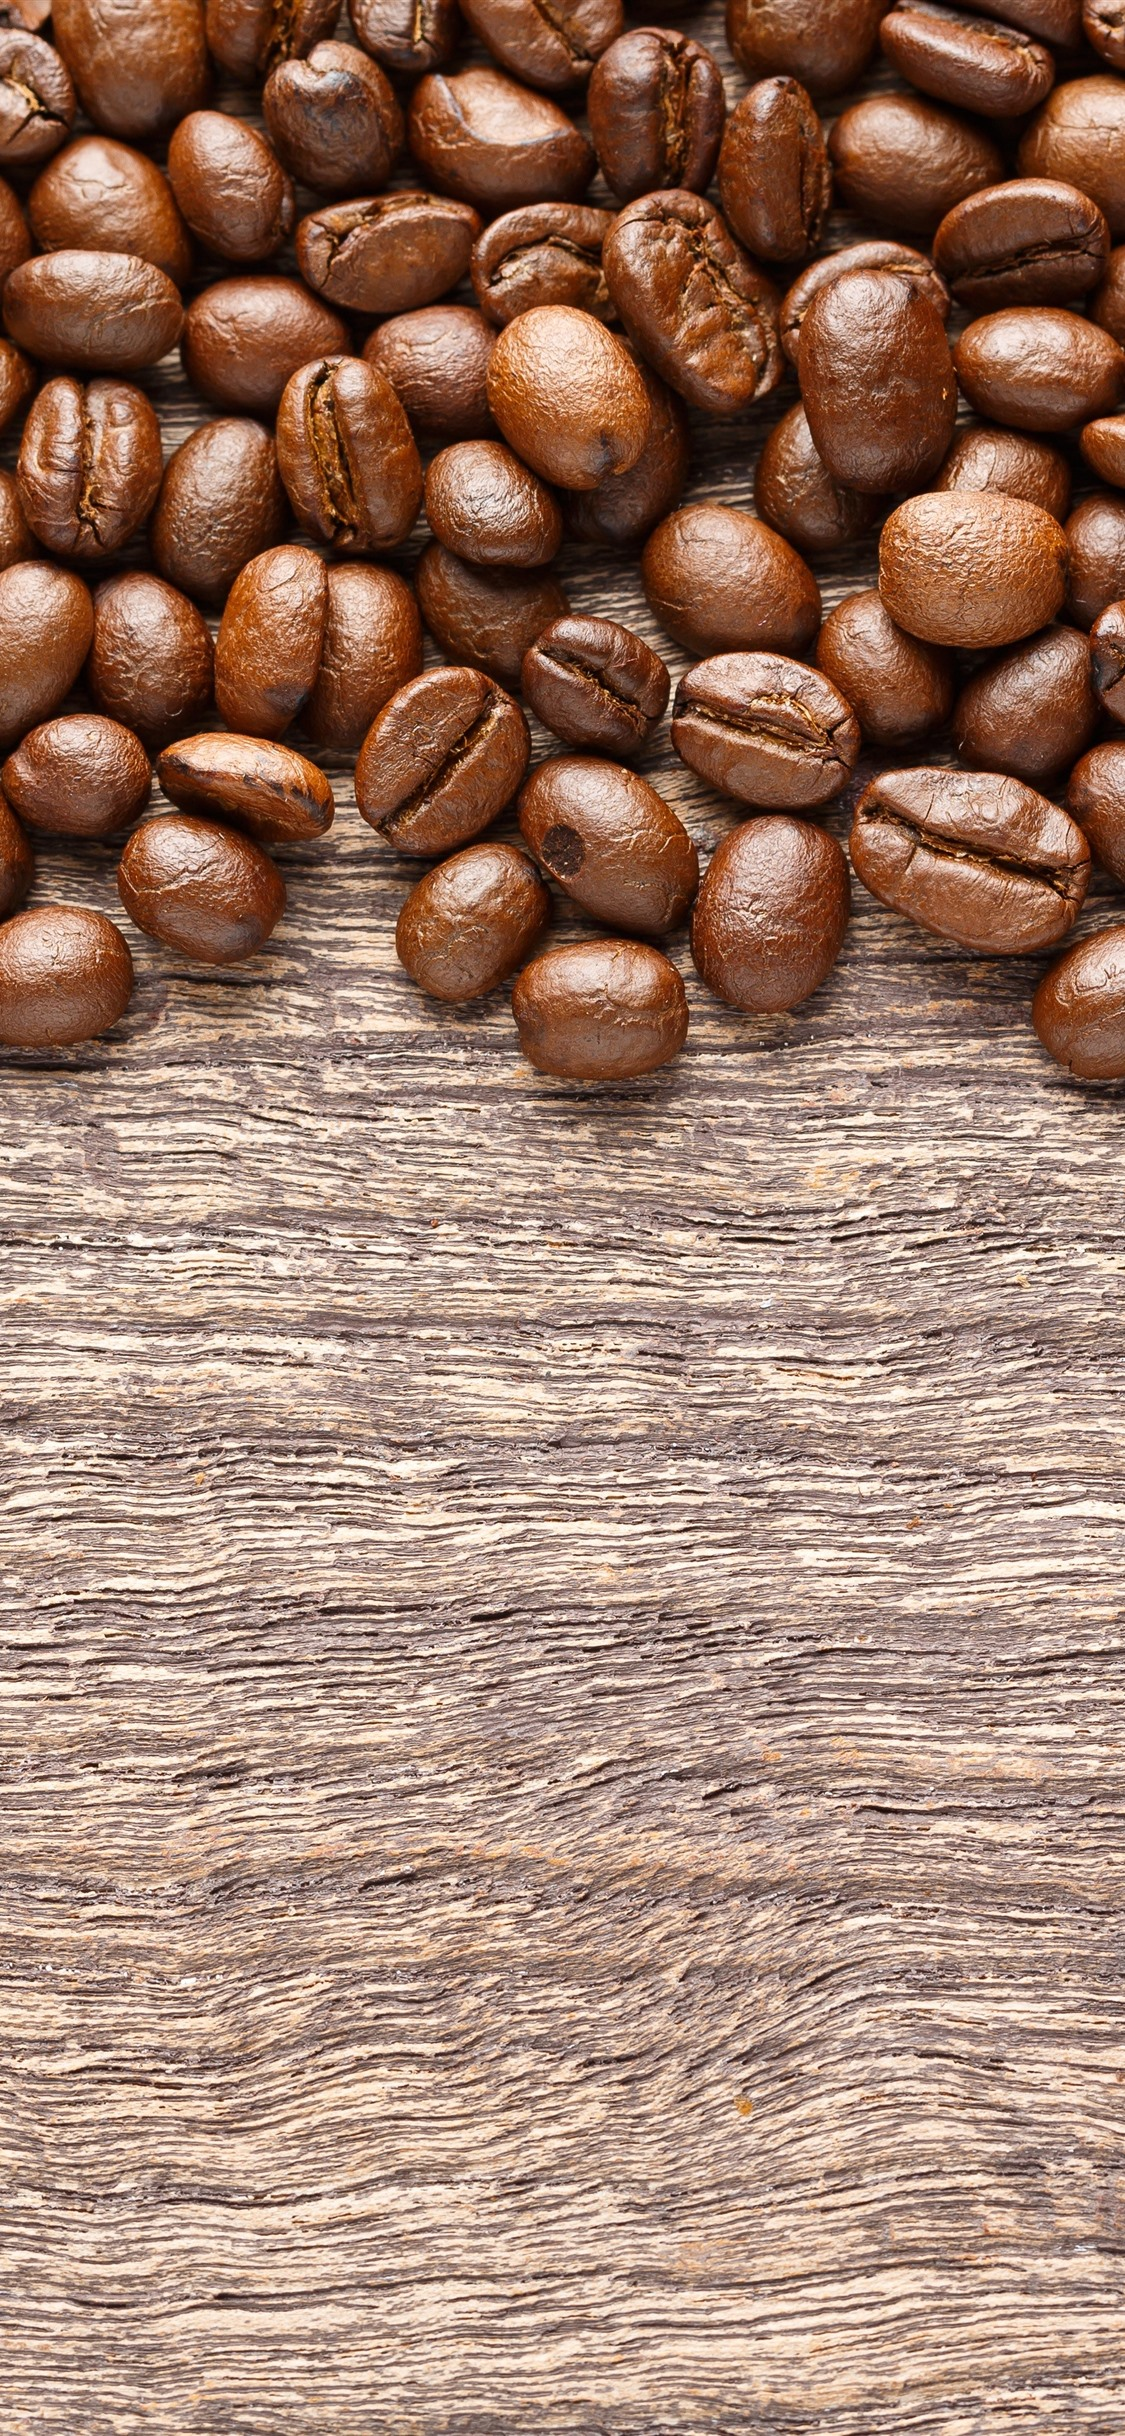 Roasted Coffee Beans Wood Board 1125x2436 Iphone Xs X